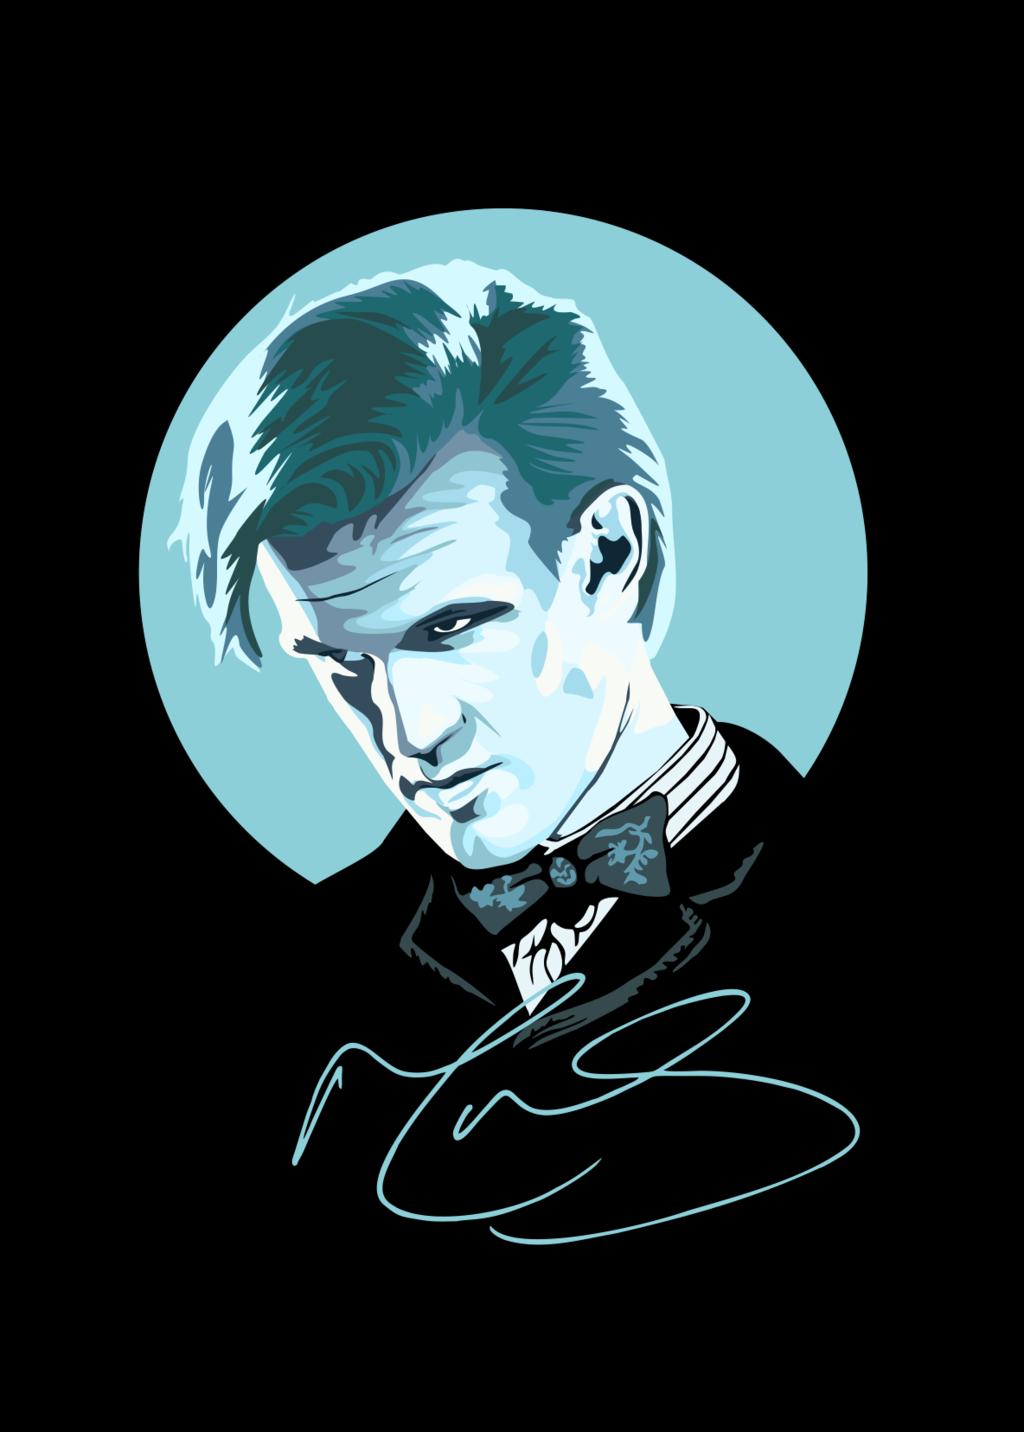 The Eleventh Doctor by ZacharyFeore.deviantart.com on @deviantART